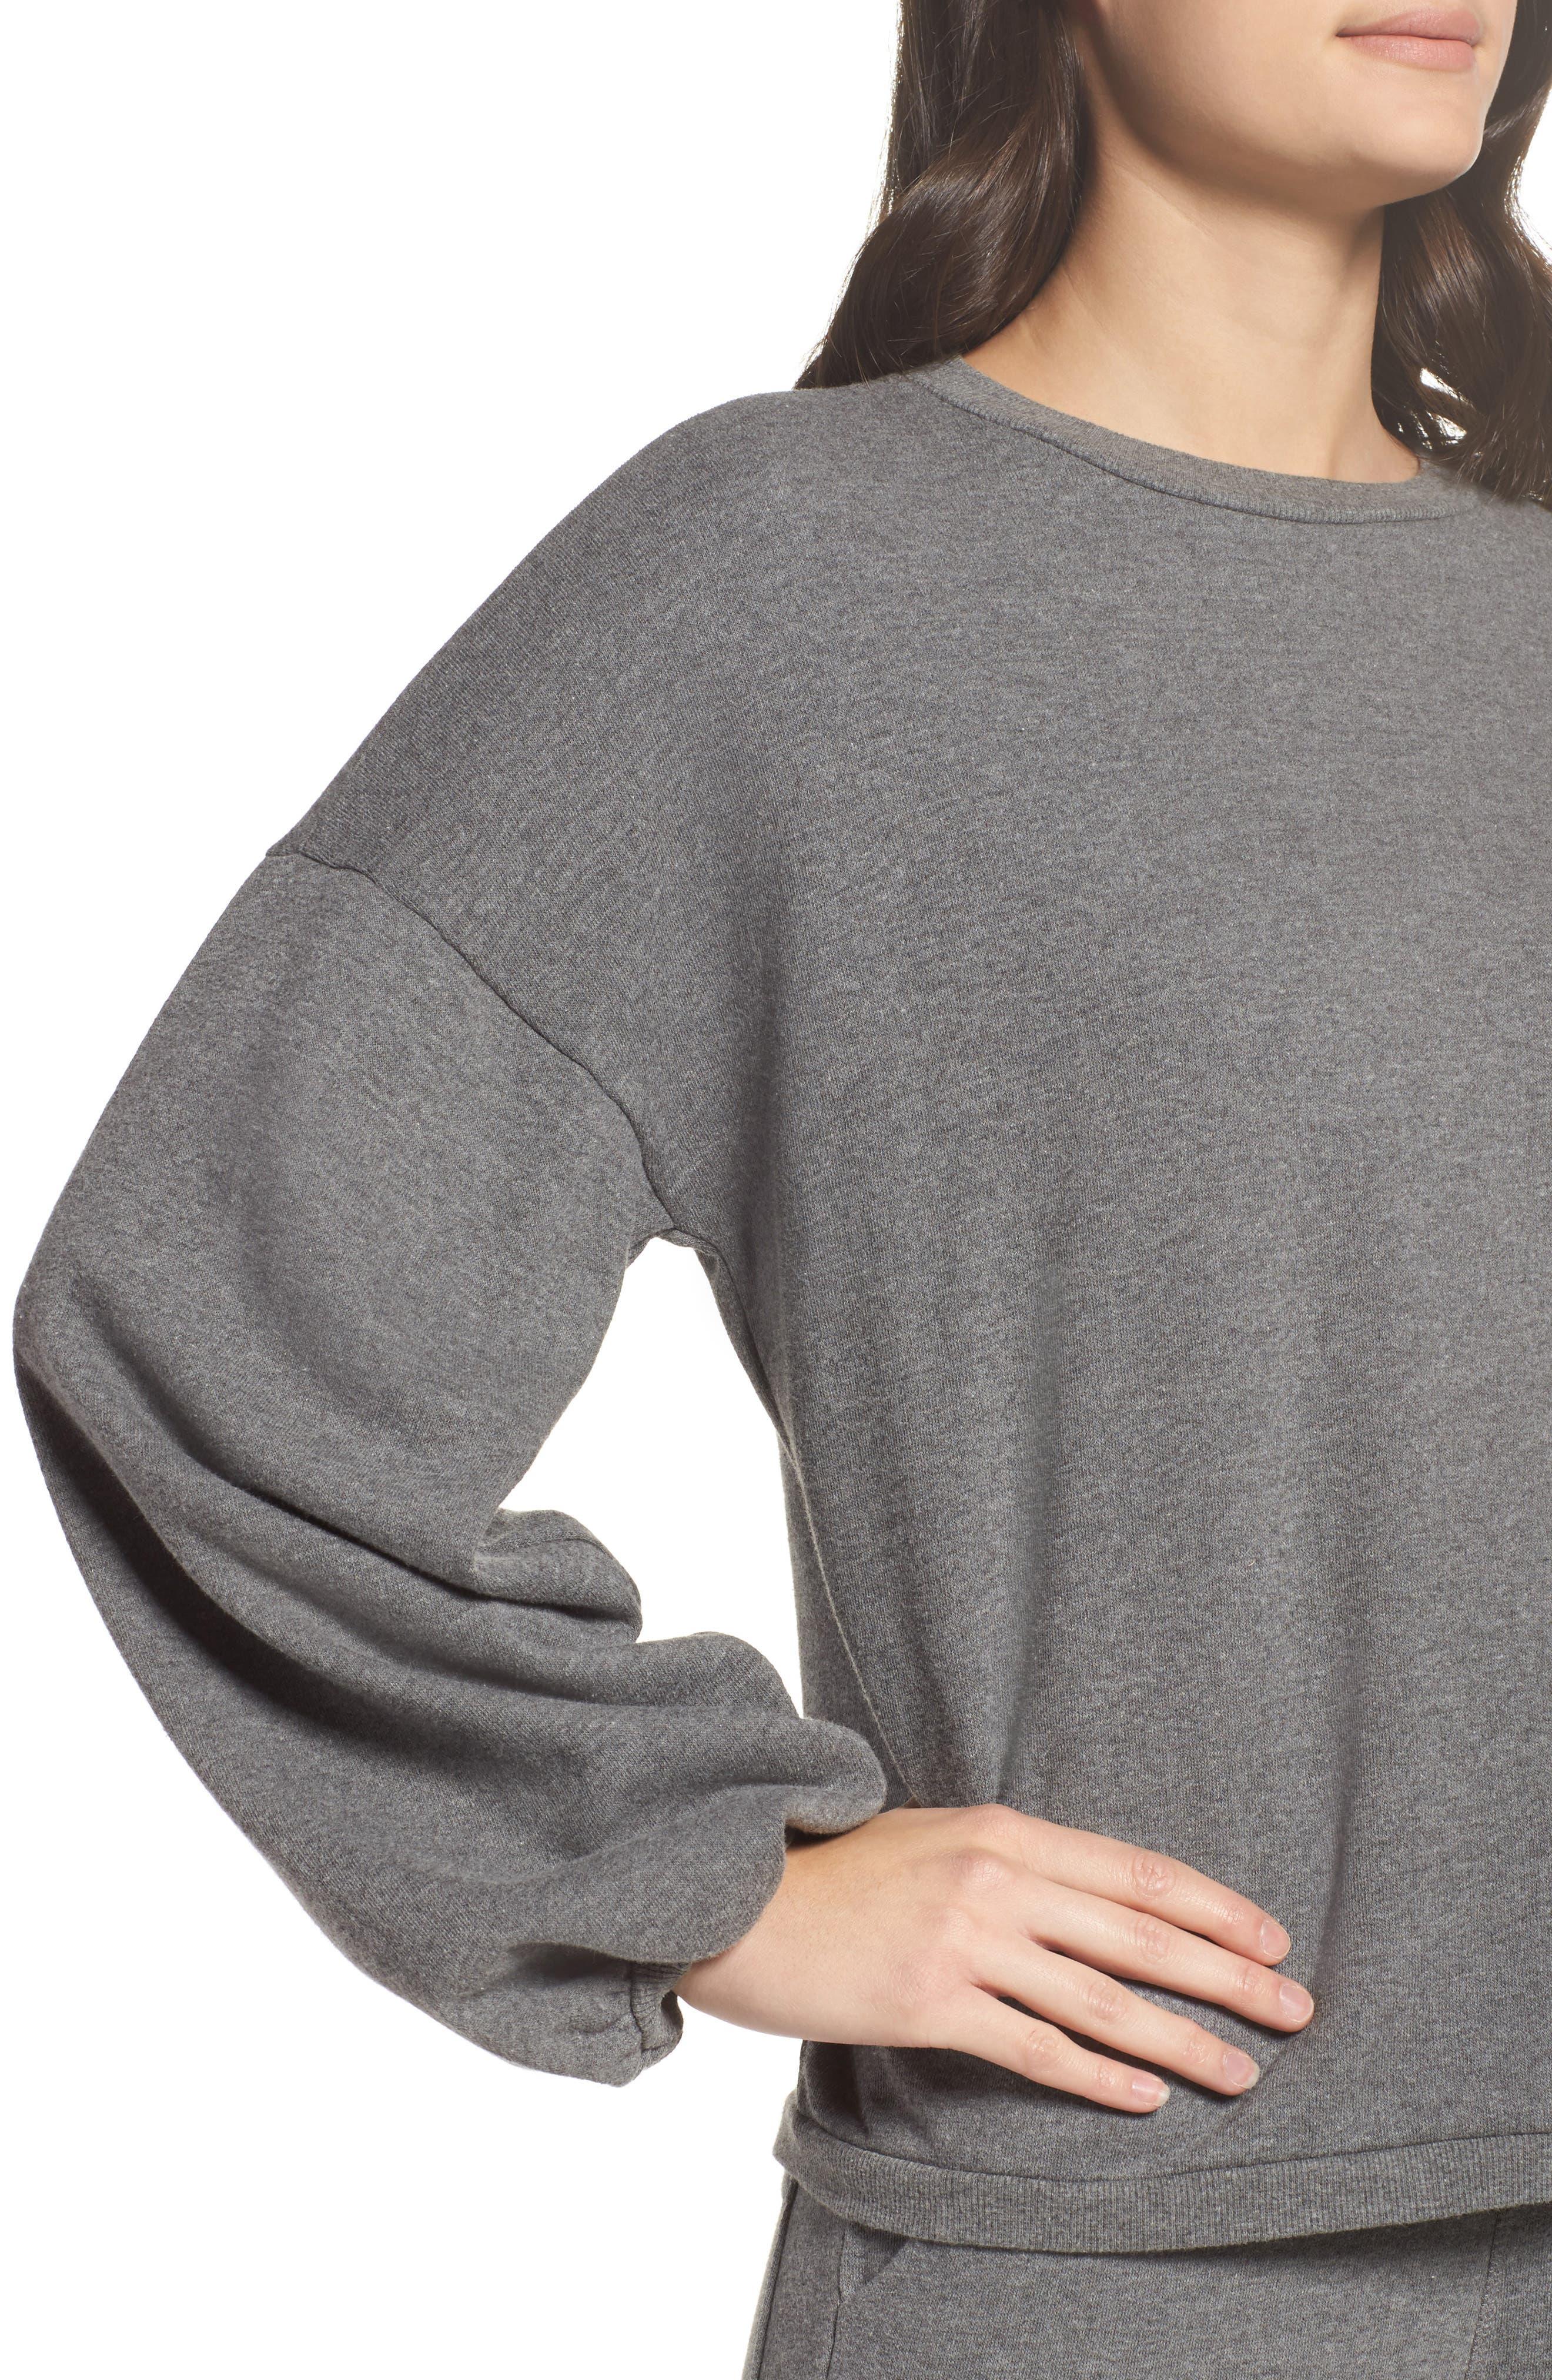 Puff Sleeve Sweatshirt,                             Alternate thumbnail 4, color,                             020